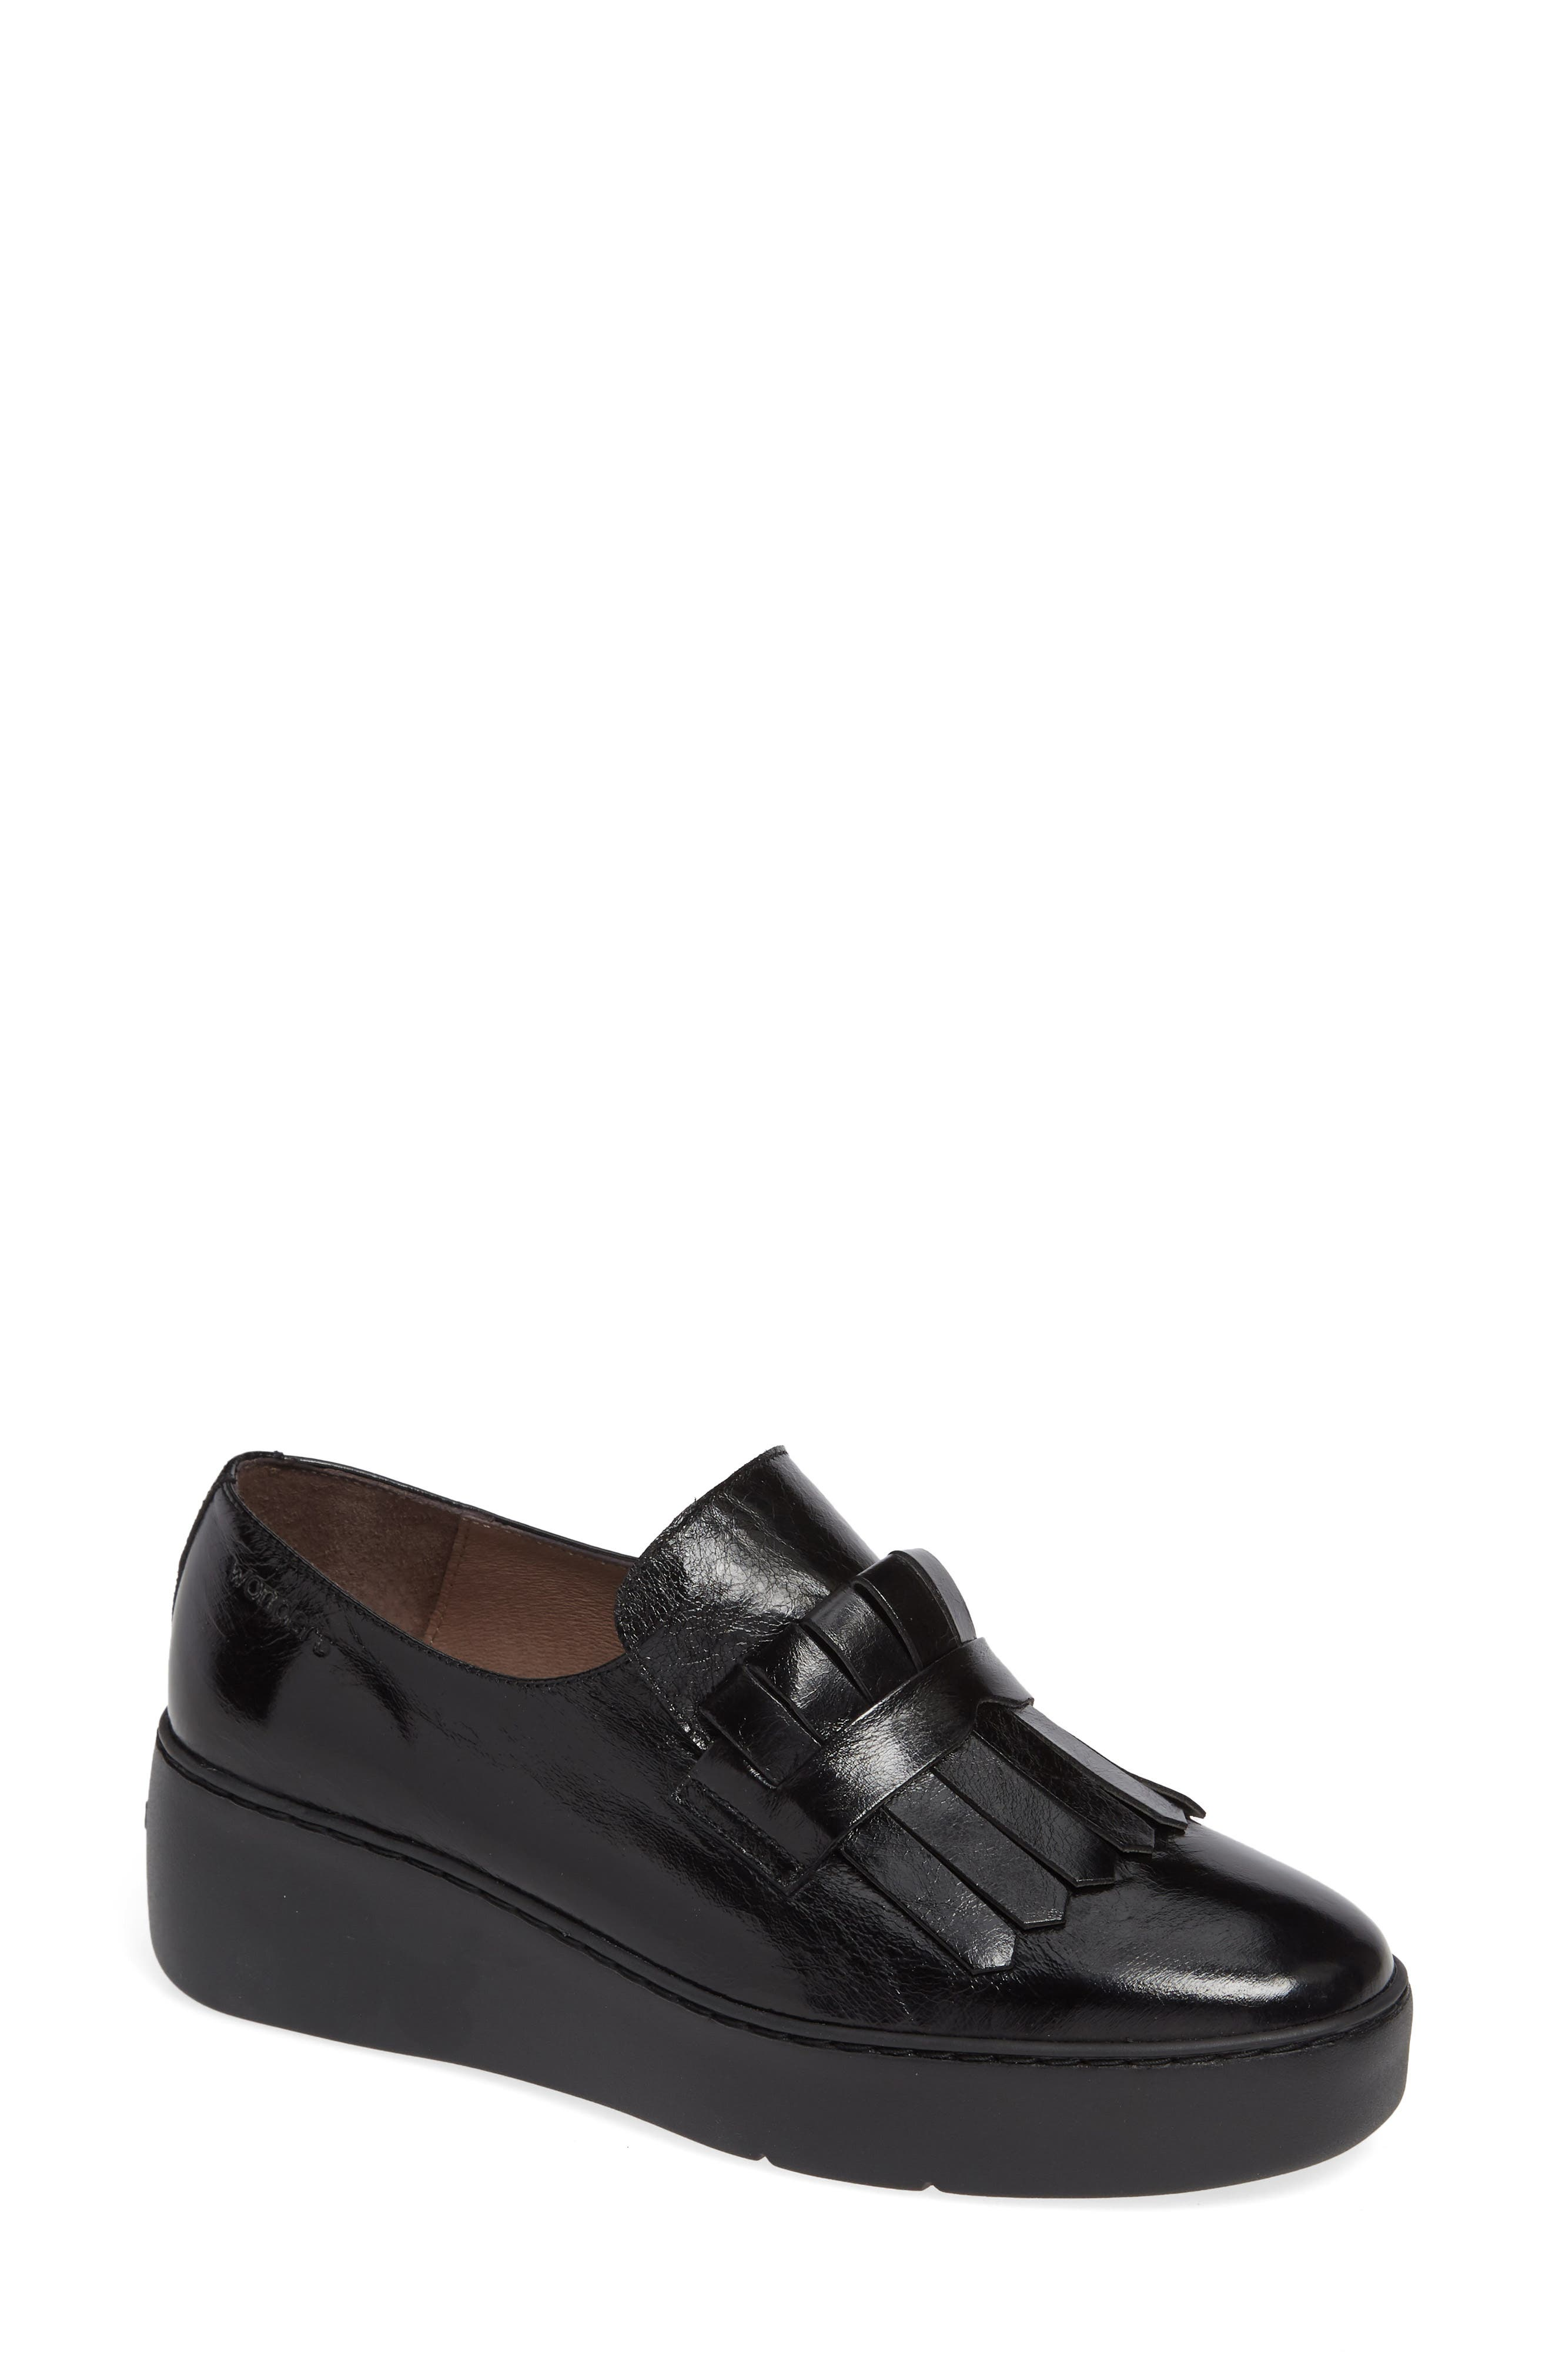 Wonders Kiltie Platform Loafer - Black